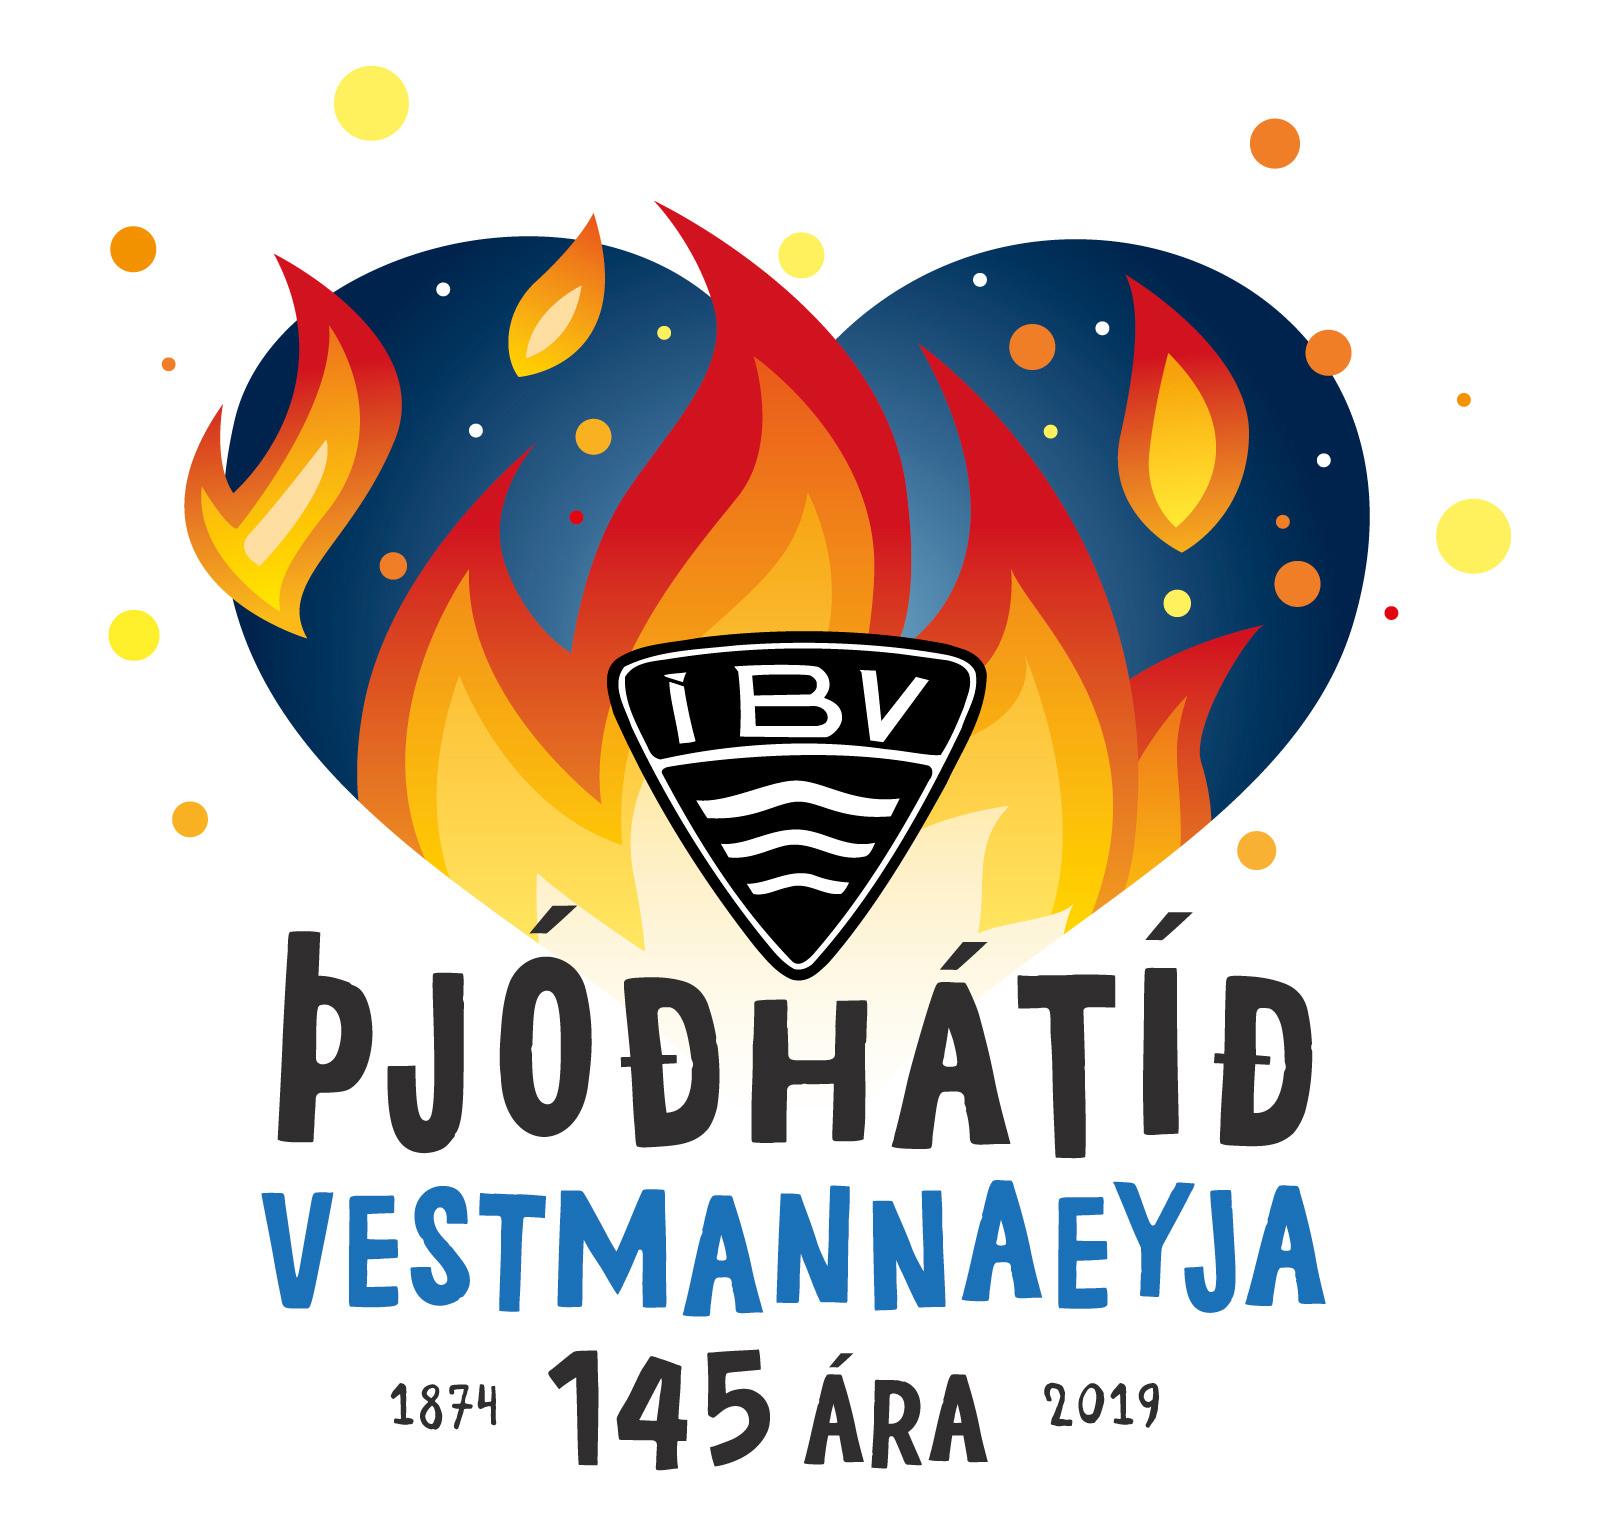 jht-2019-145ra-merki-vali